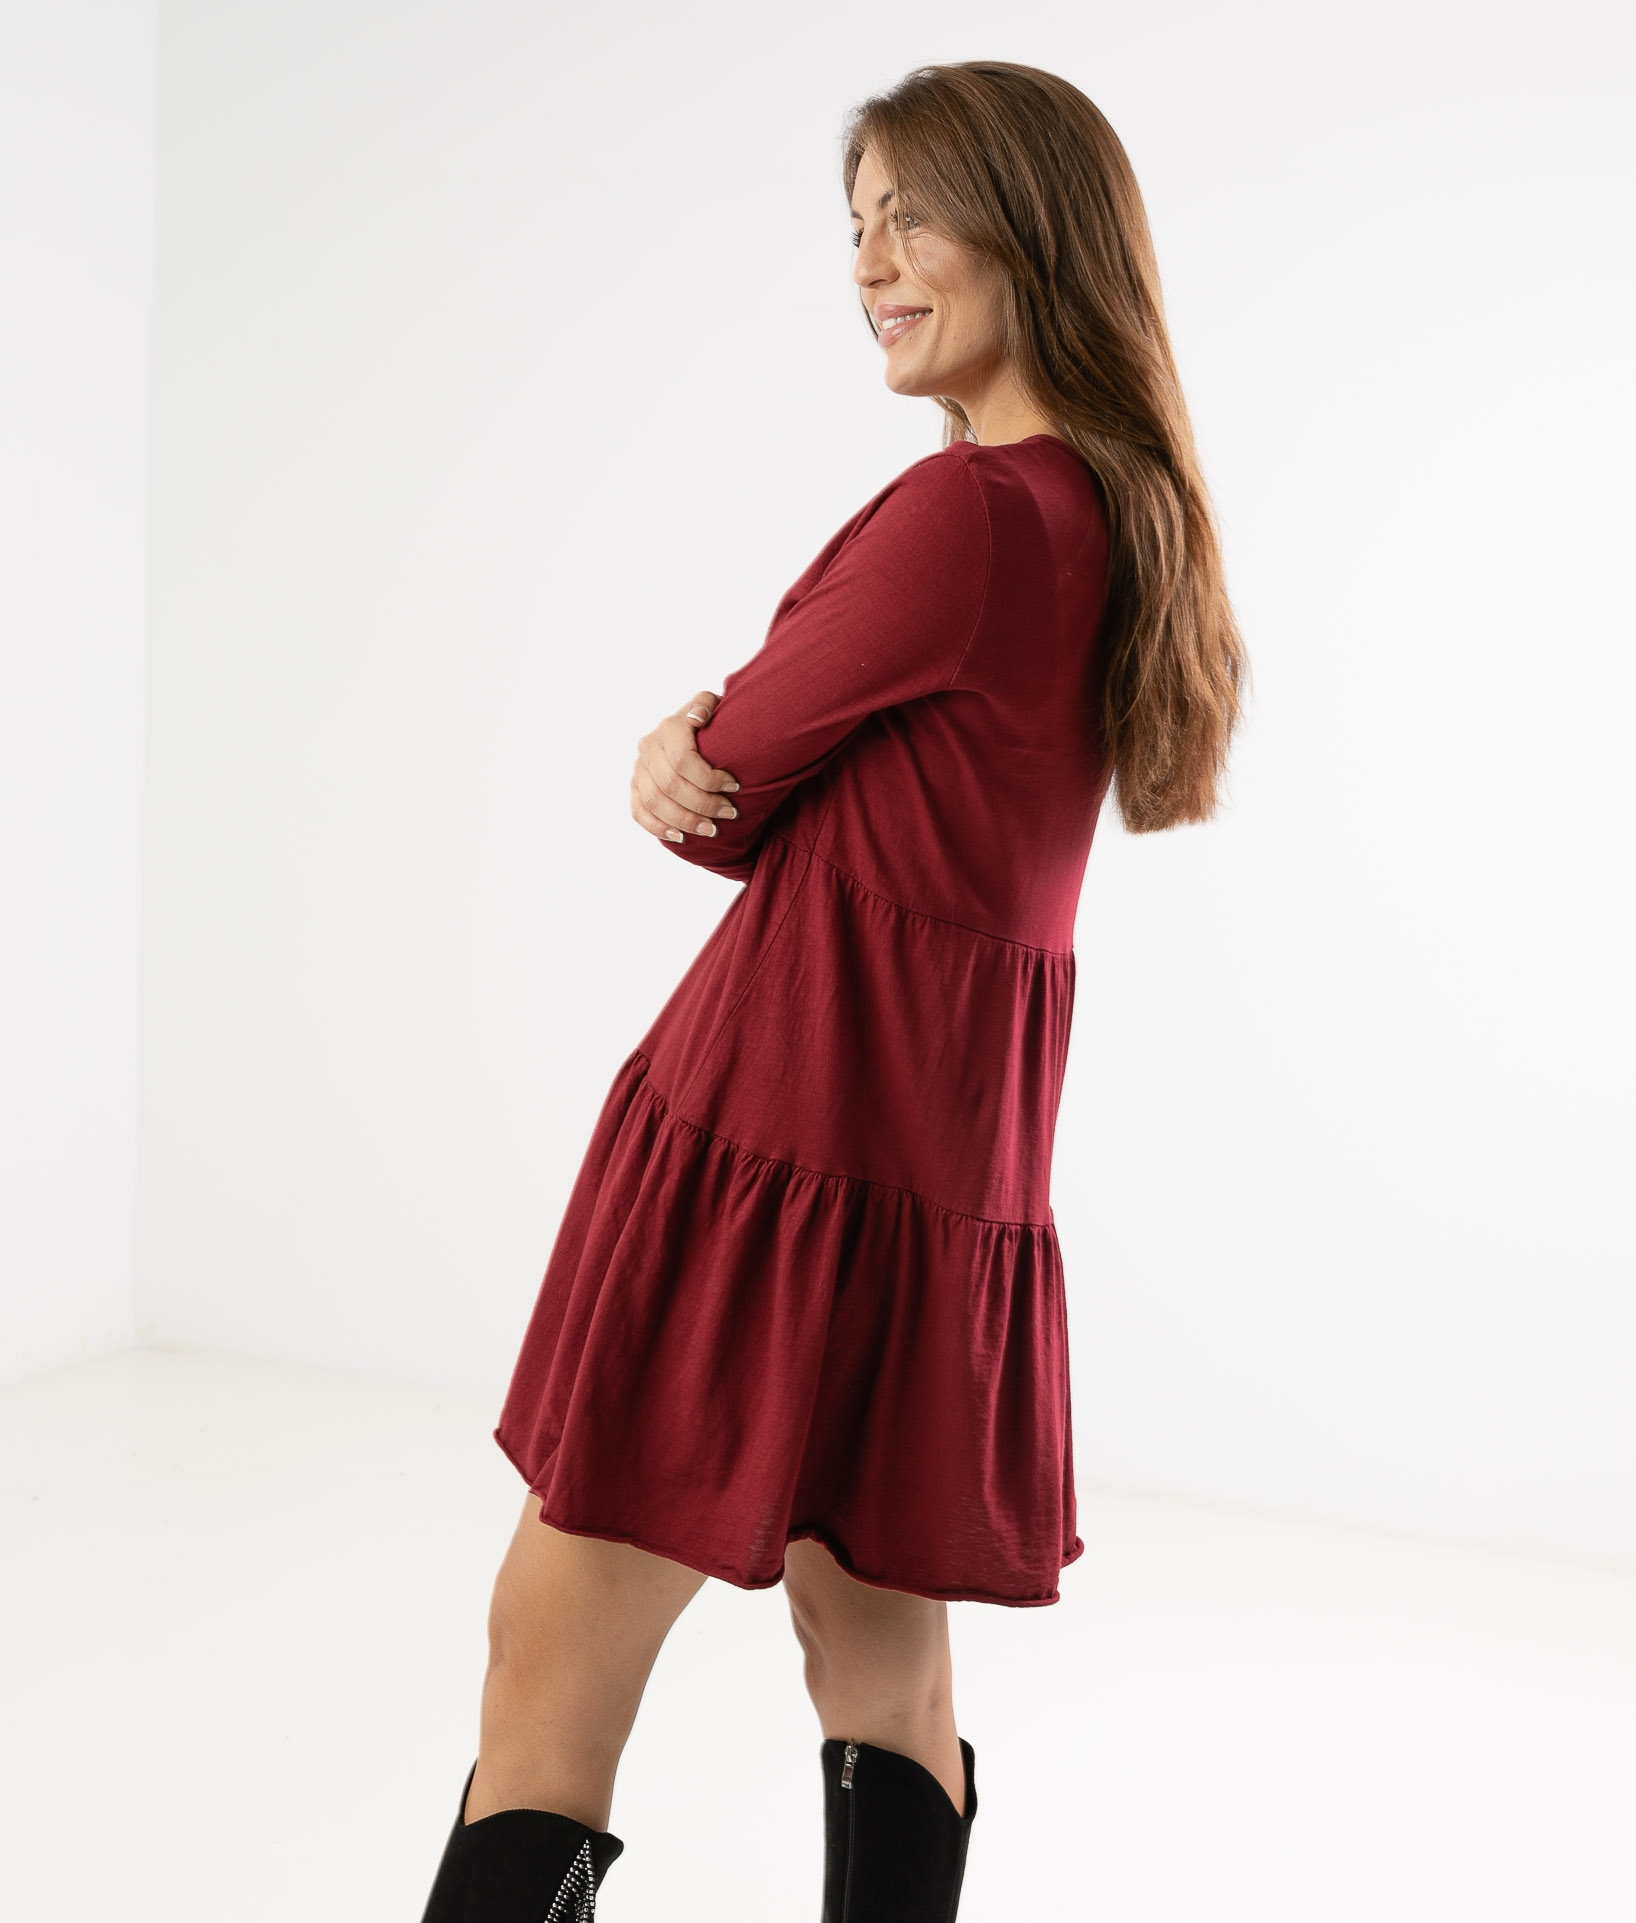 CIMERA DRESS - MAROON